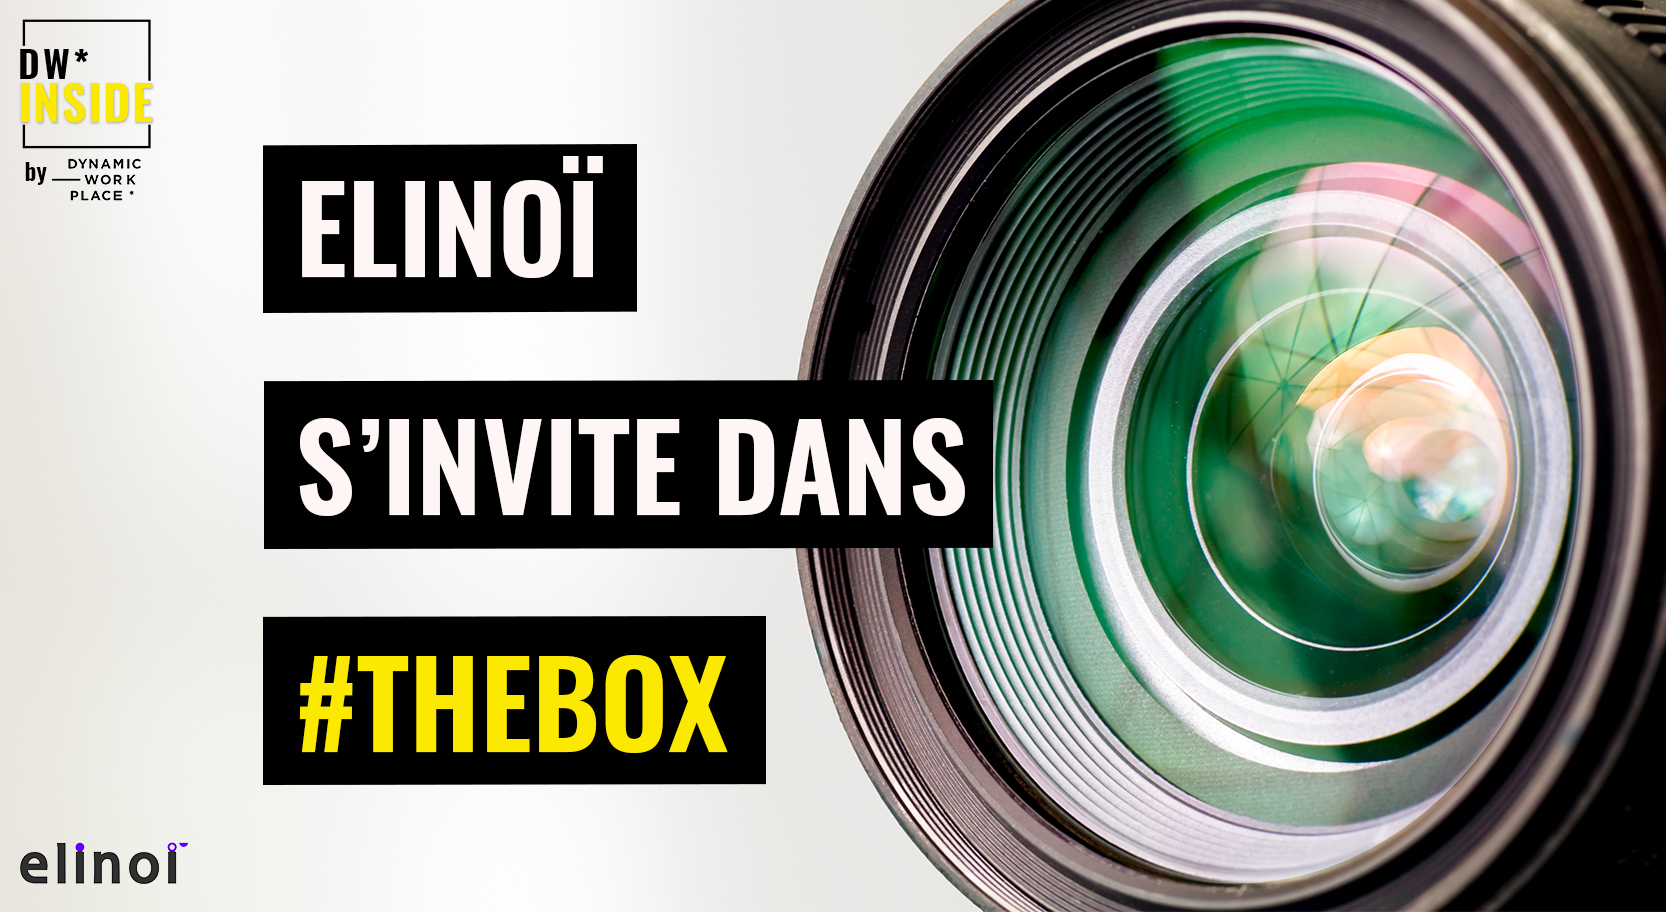 Elinoi s'invite dans TheBox